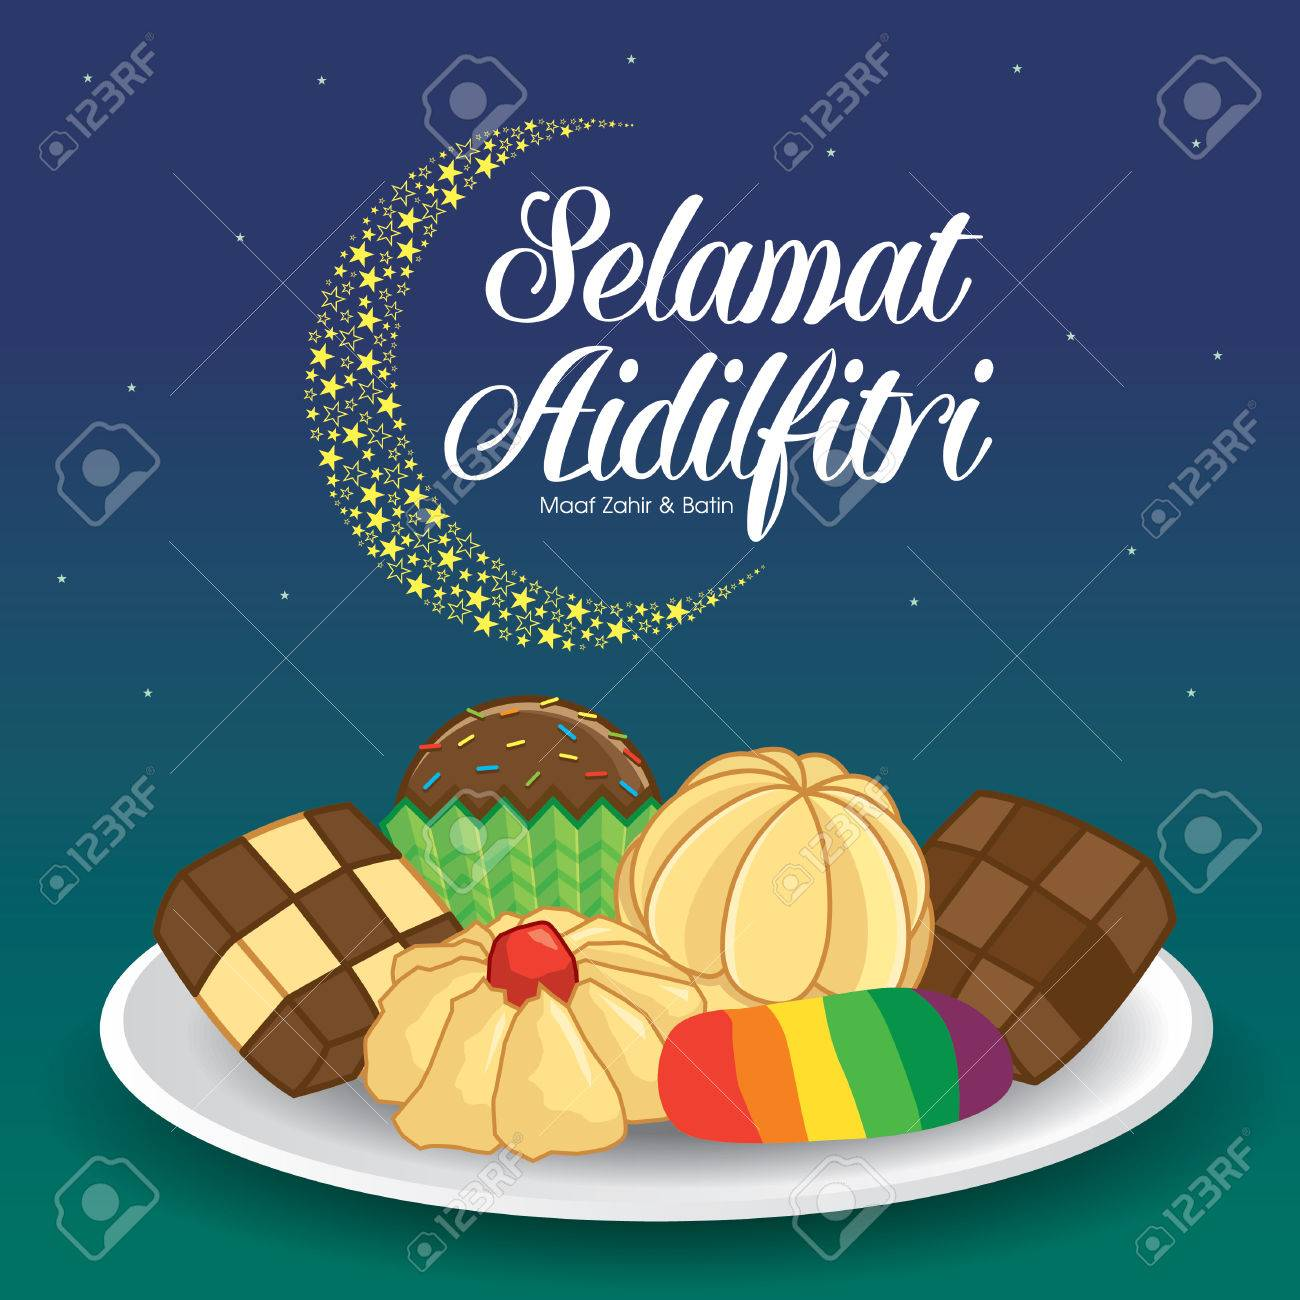 Selamat Hari Raya Aidilfitri vector illustration with traditional kuih raya. Caption: Fasting Day of Celebration - 79076424